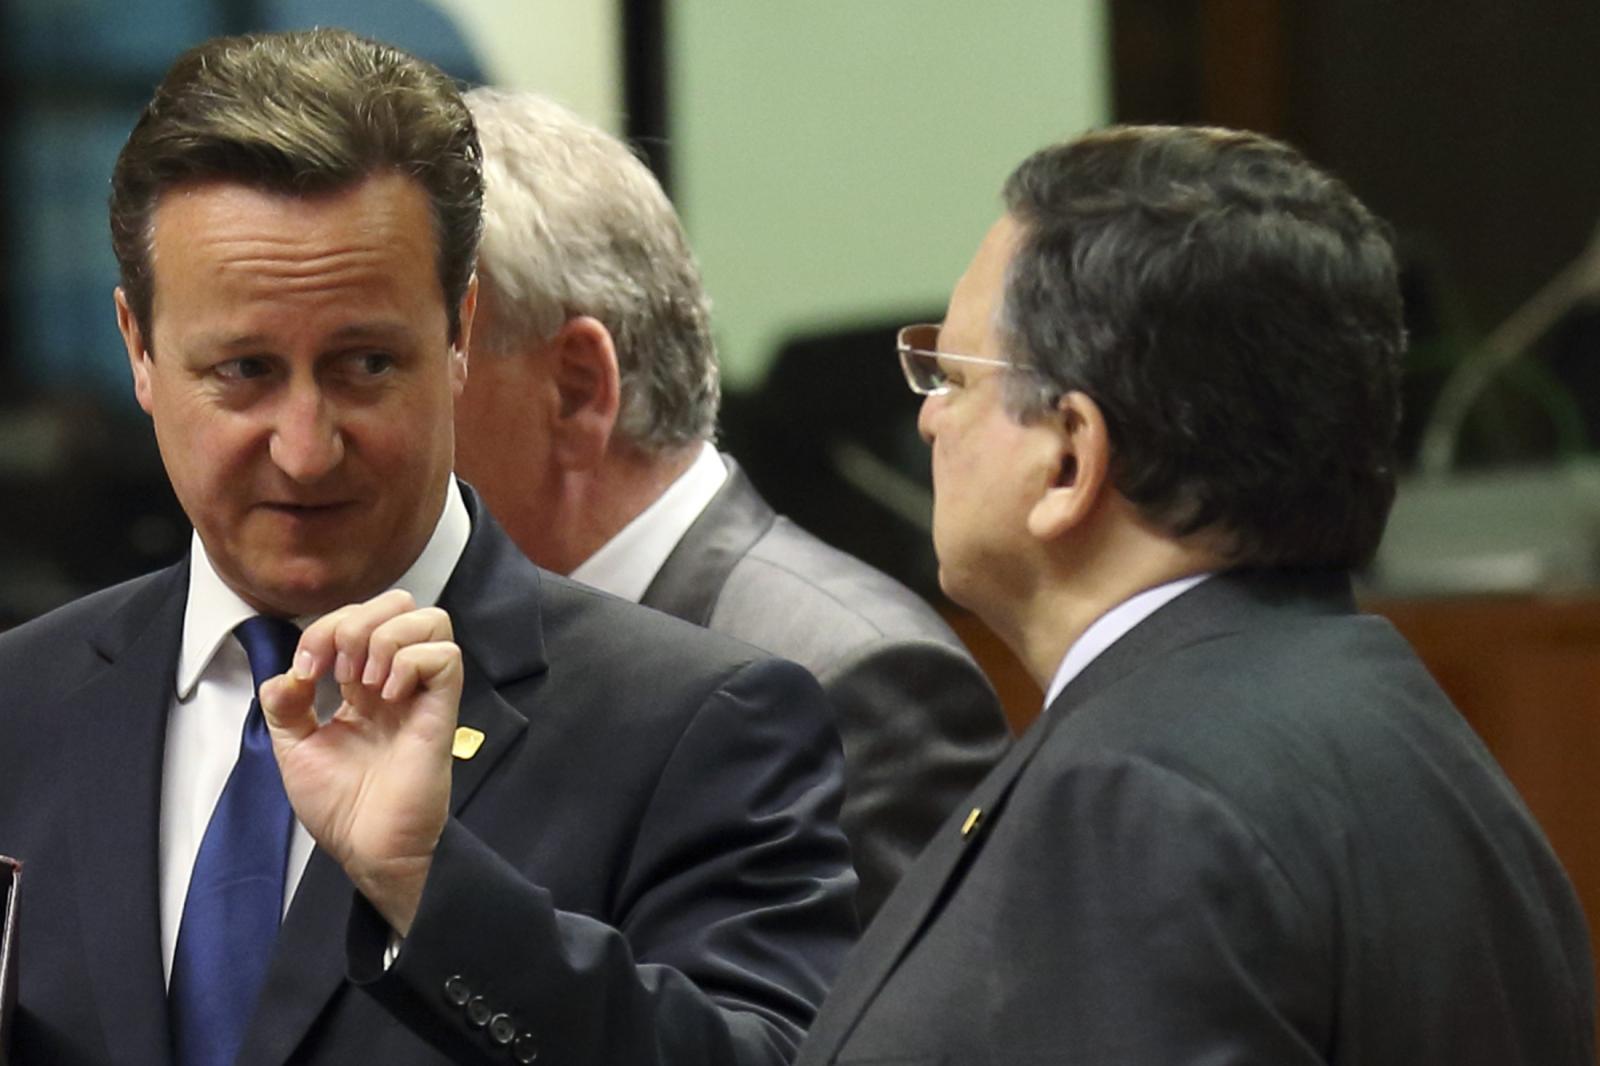 David Cameron and Jose Manuel Barroso